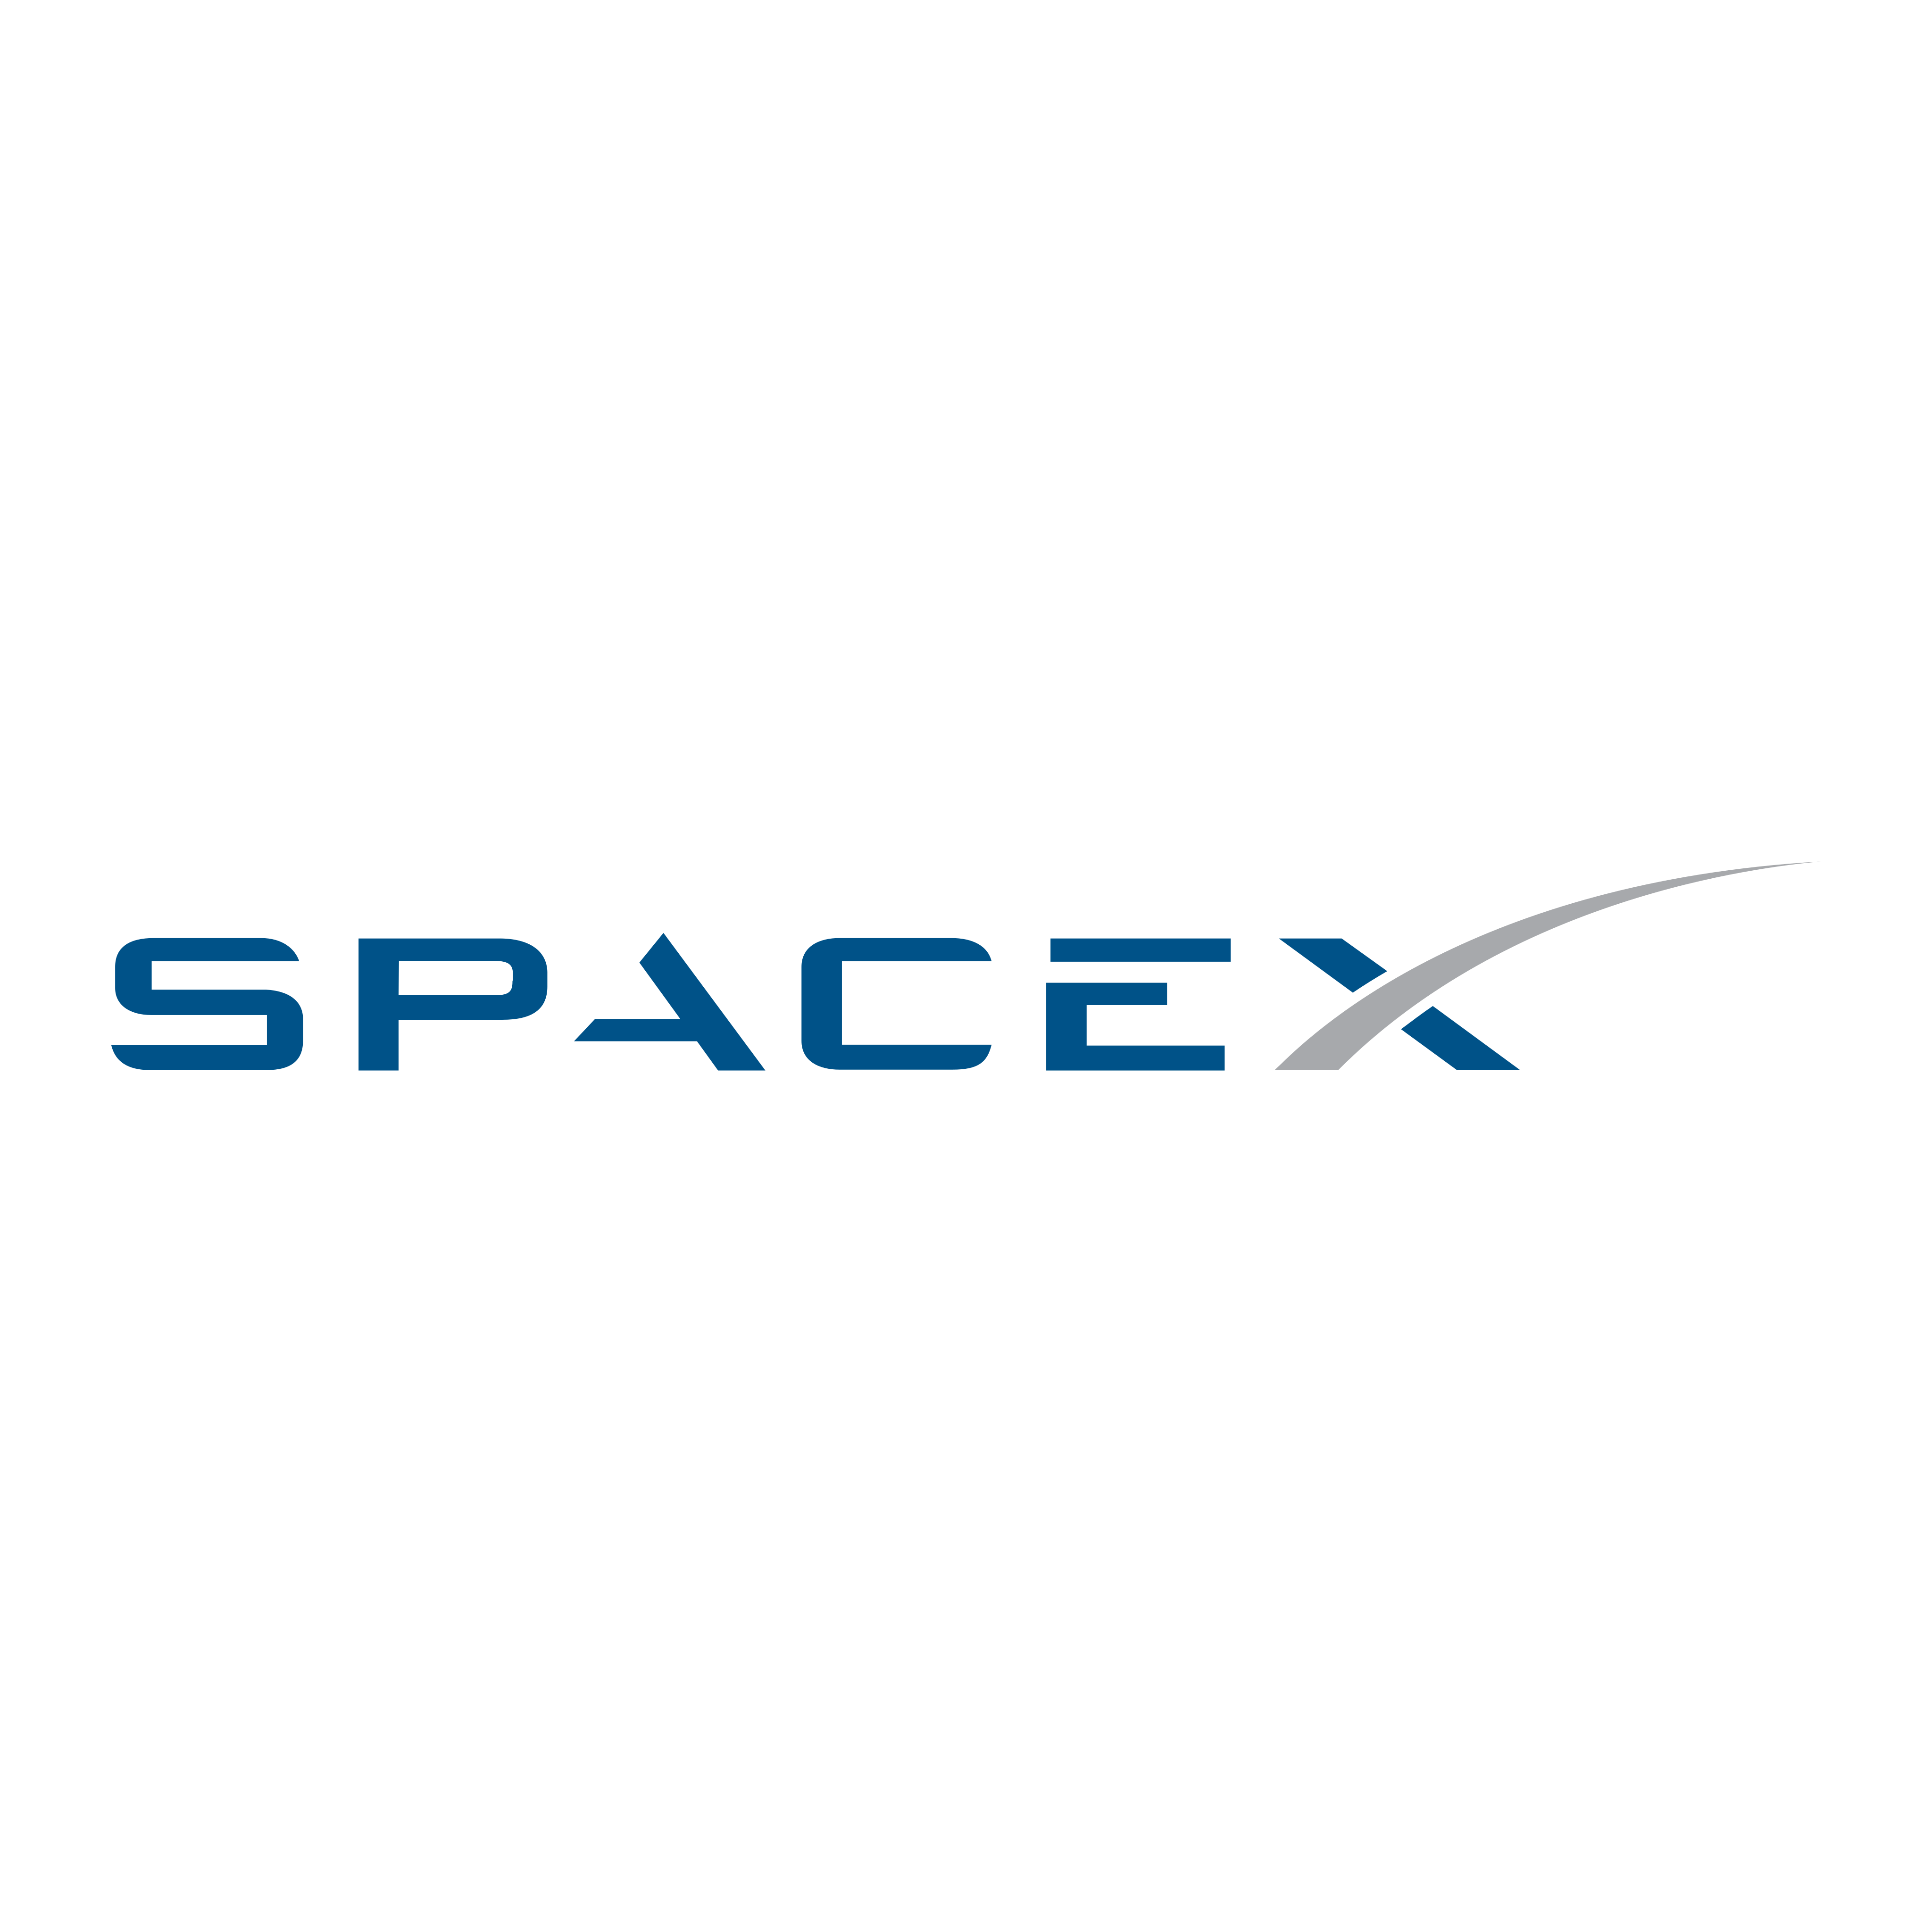 spacex logo 0 - SpaceX Logo